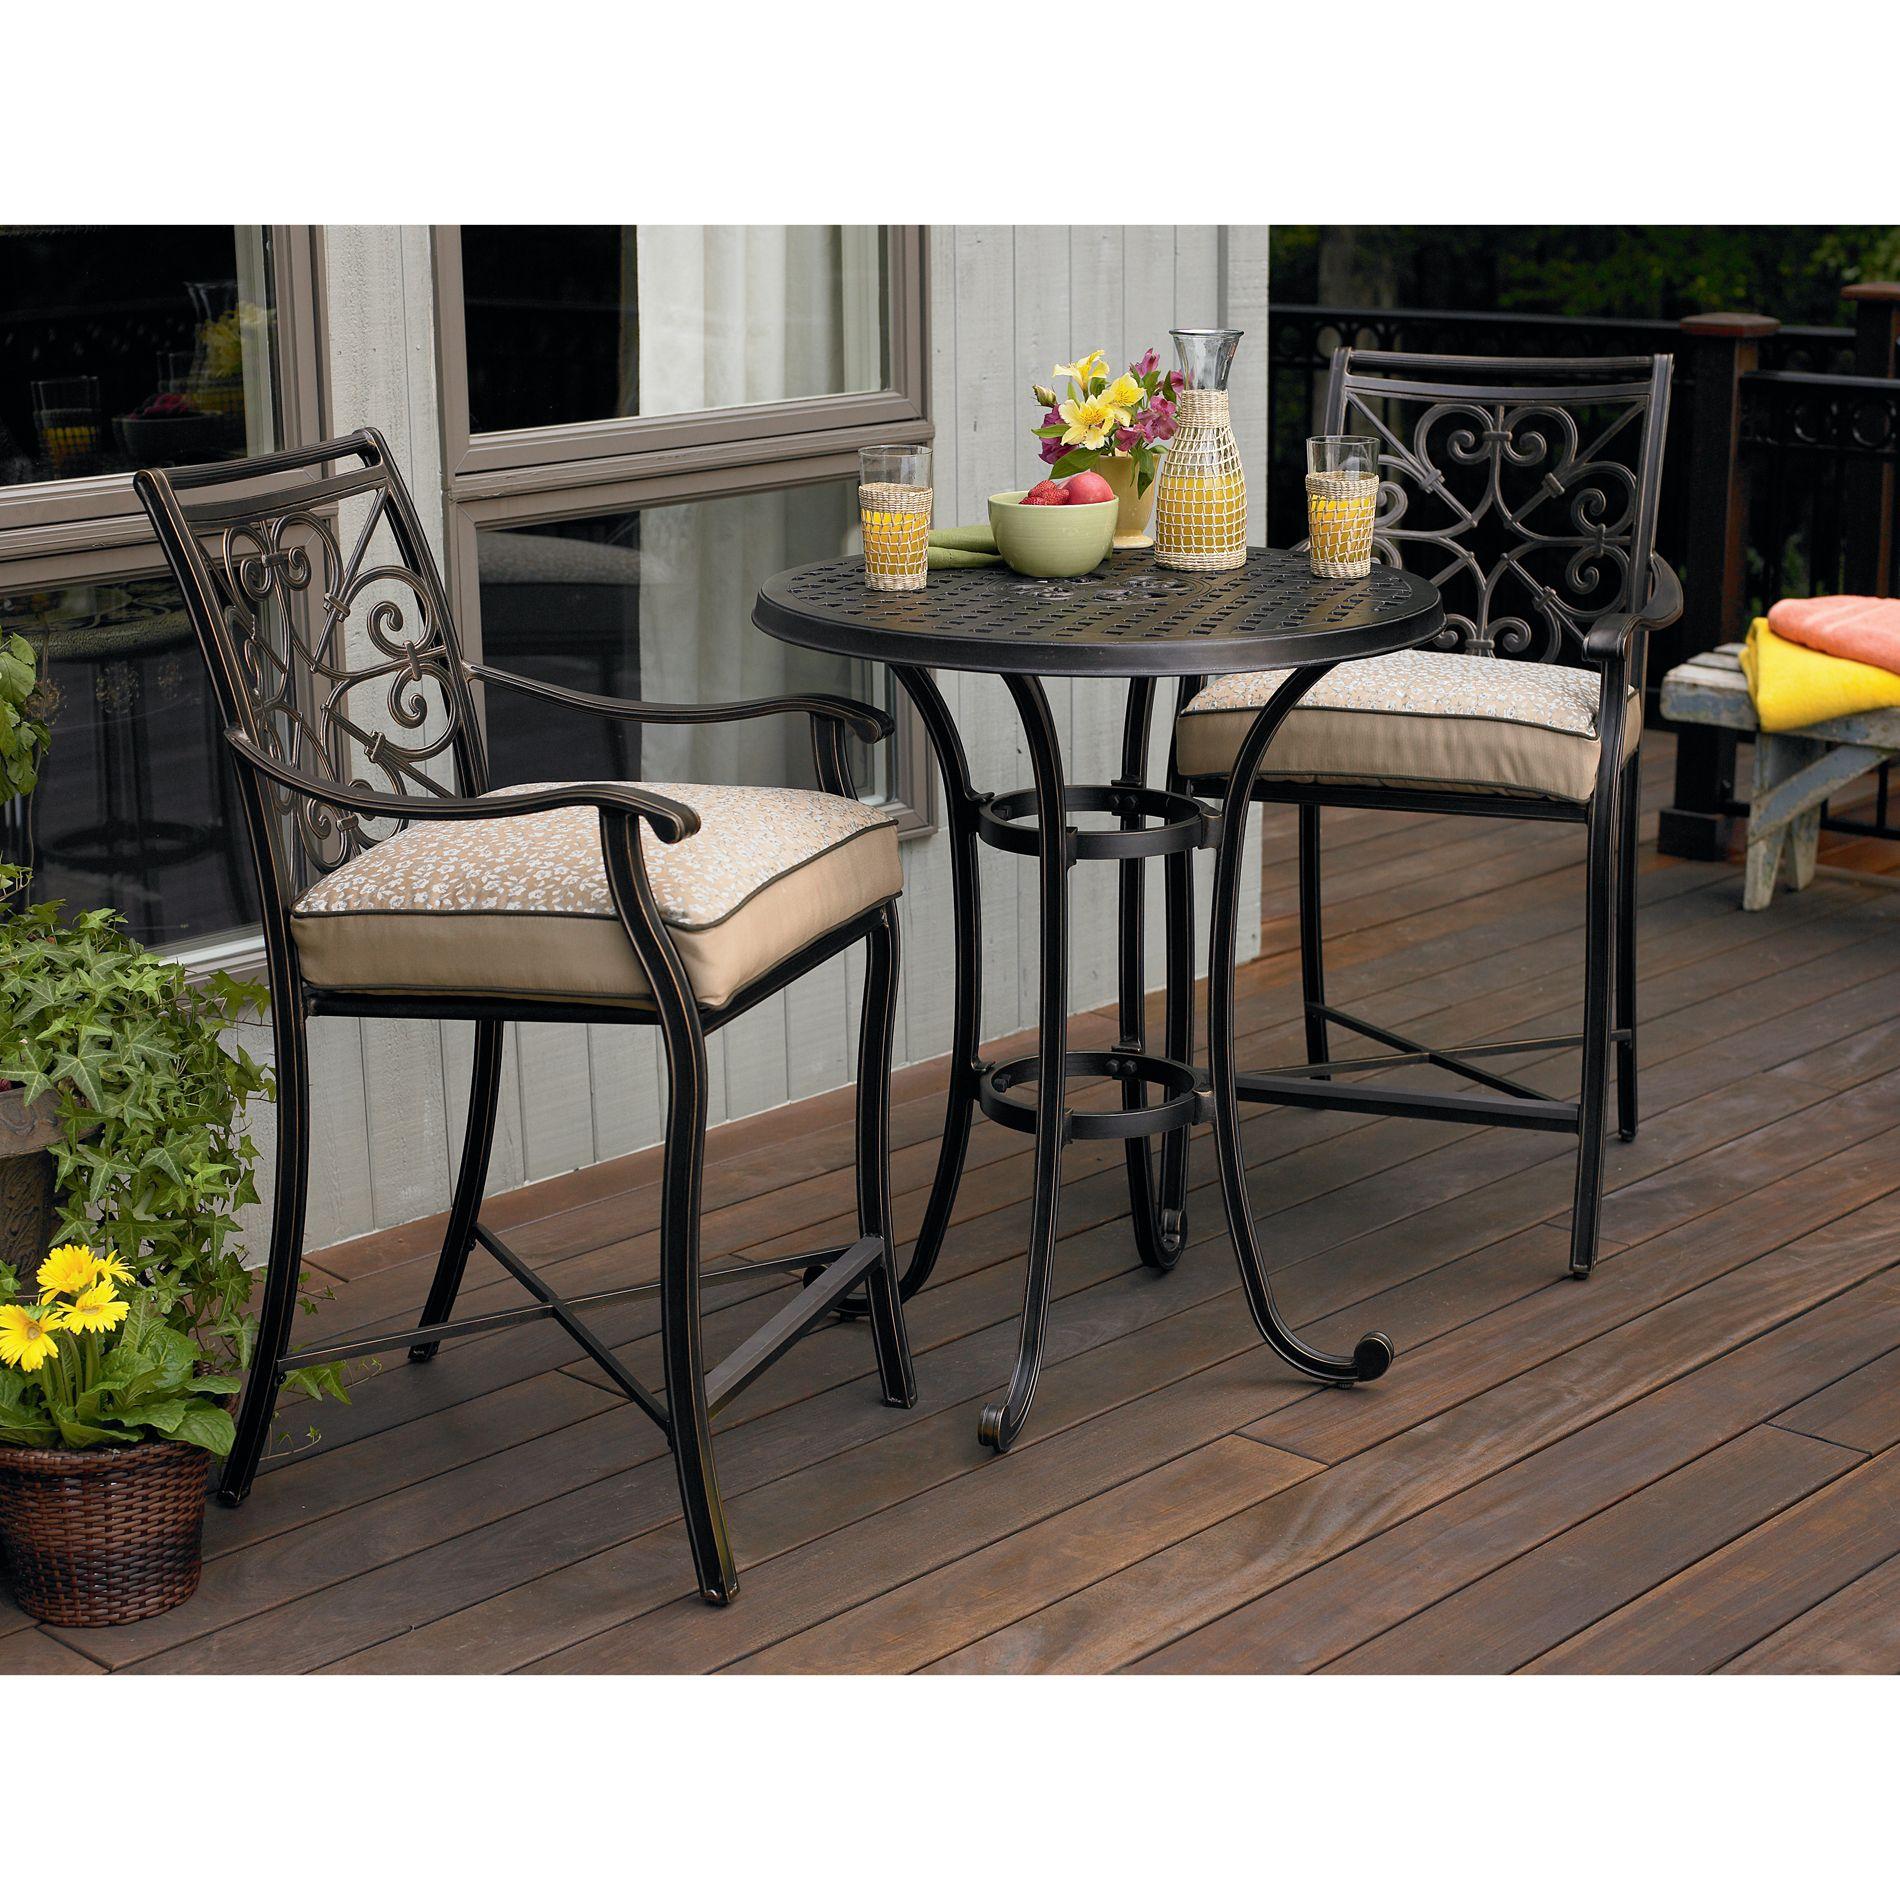 patio furniture bistro sets photo - 2